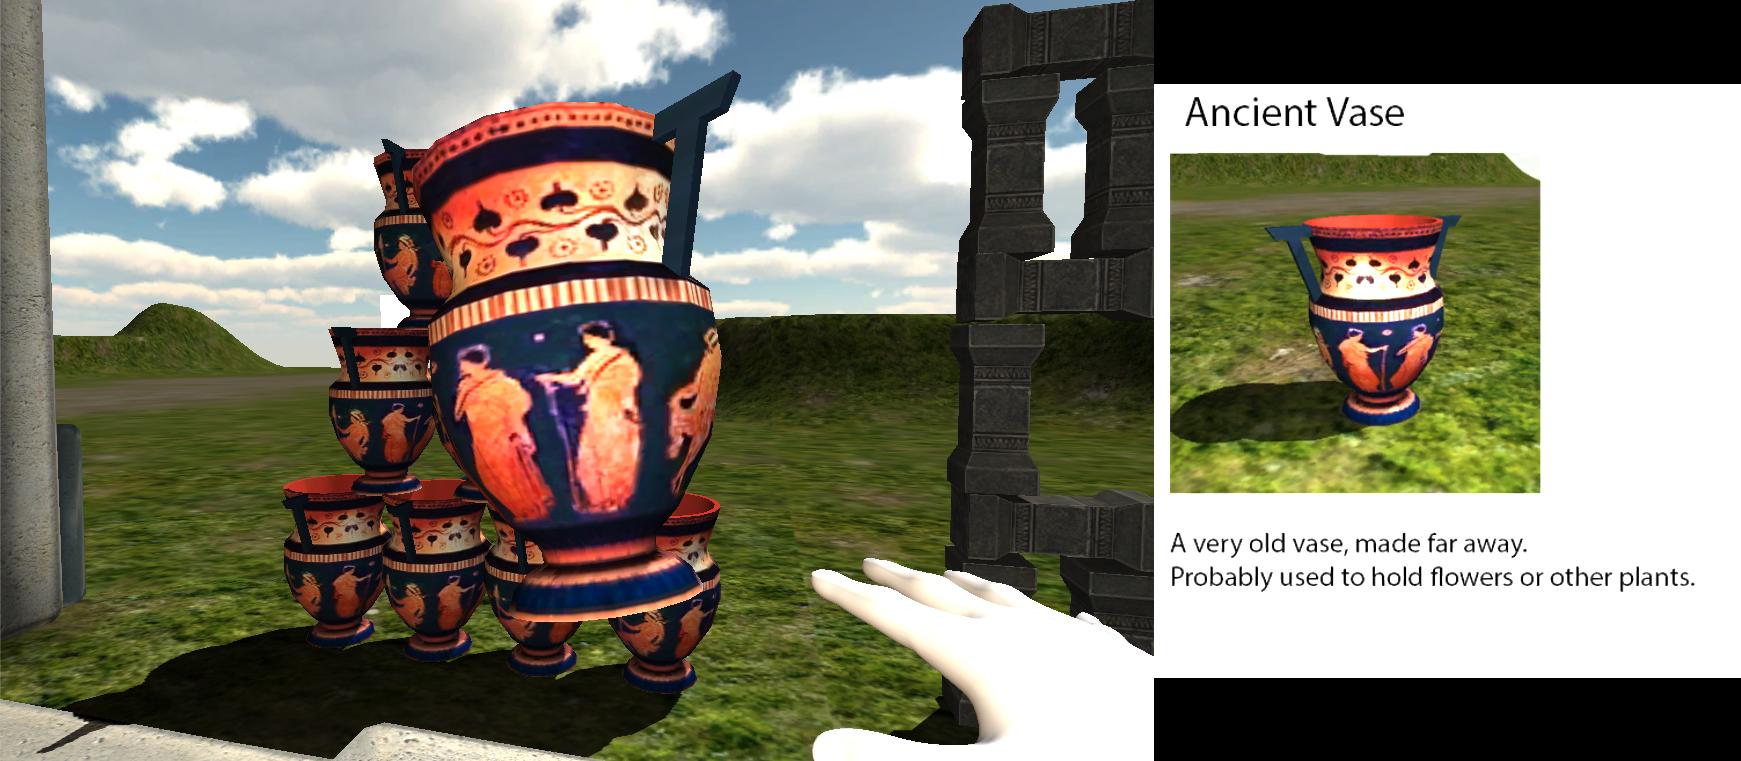 Kinect SDK 2 FINGER TRACKING (etc) for Desktops & Large Screens (VR